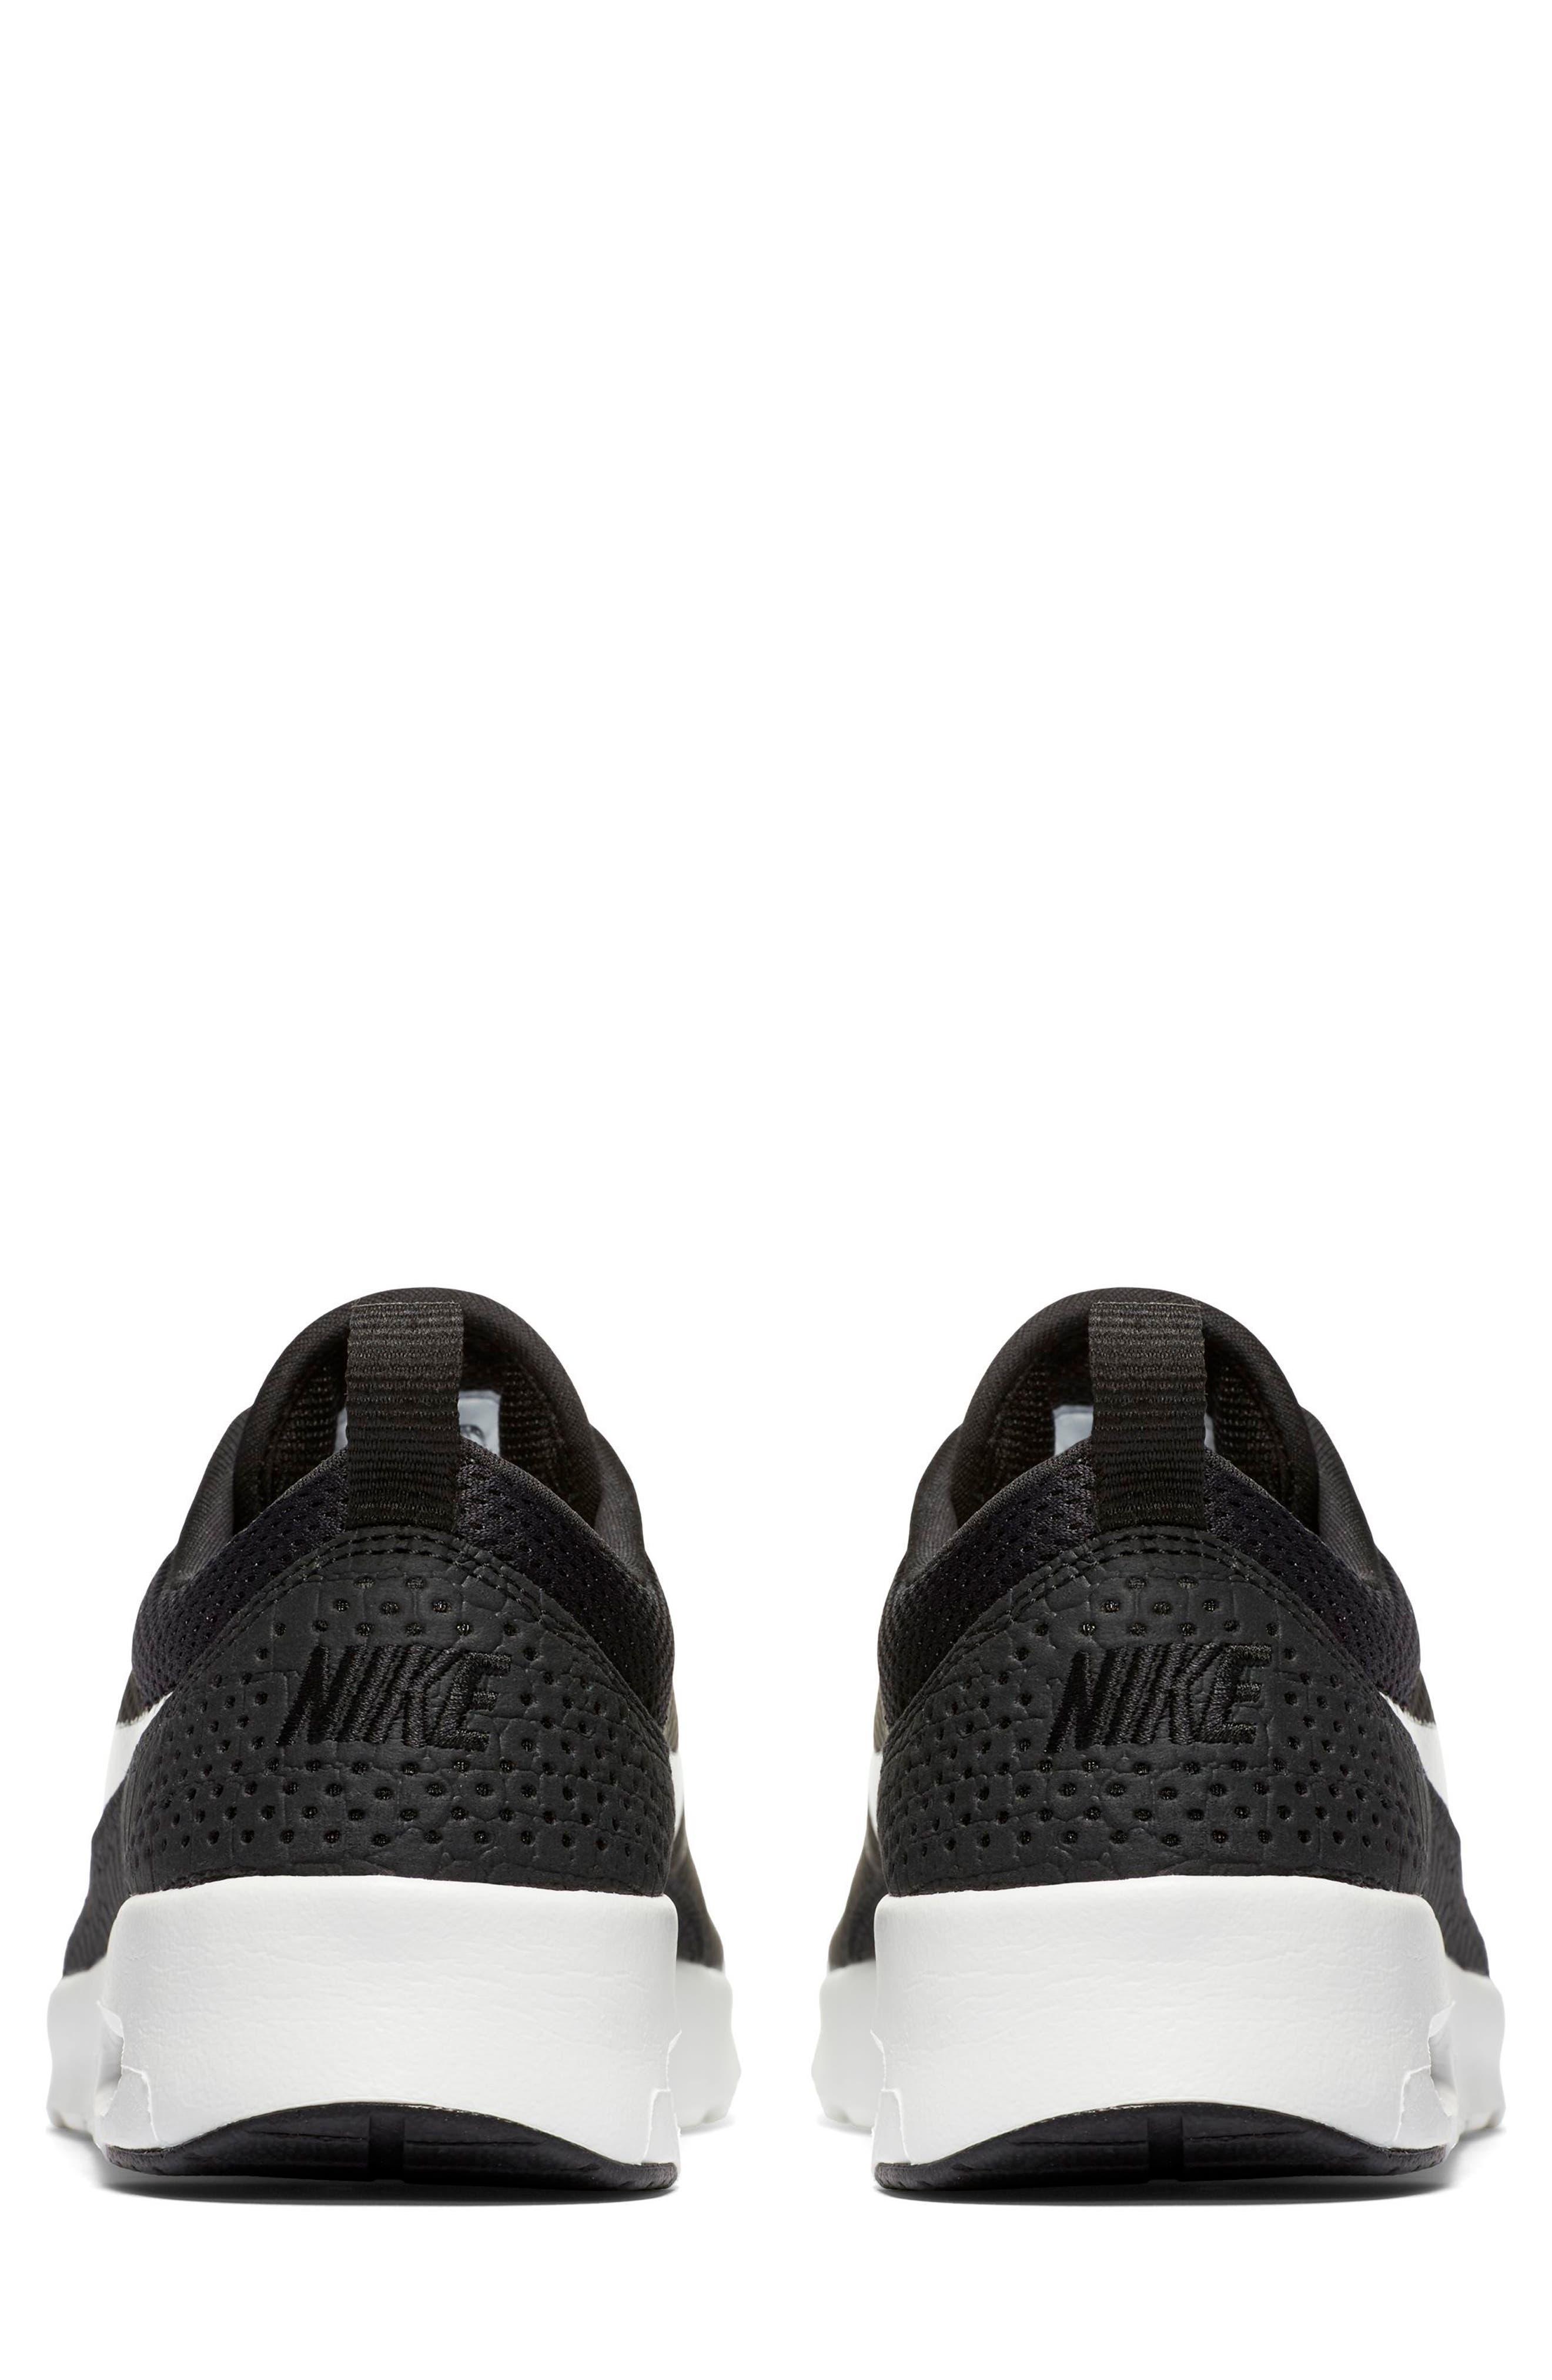 Air Max Thea Sneaker,                             Alternate thumbnail 2, color,                             020